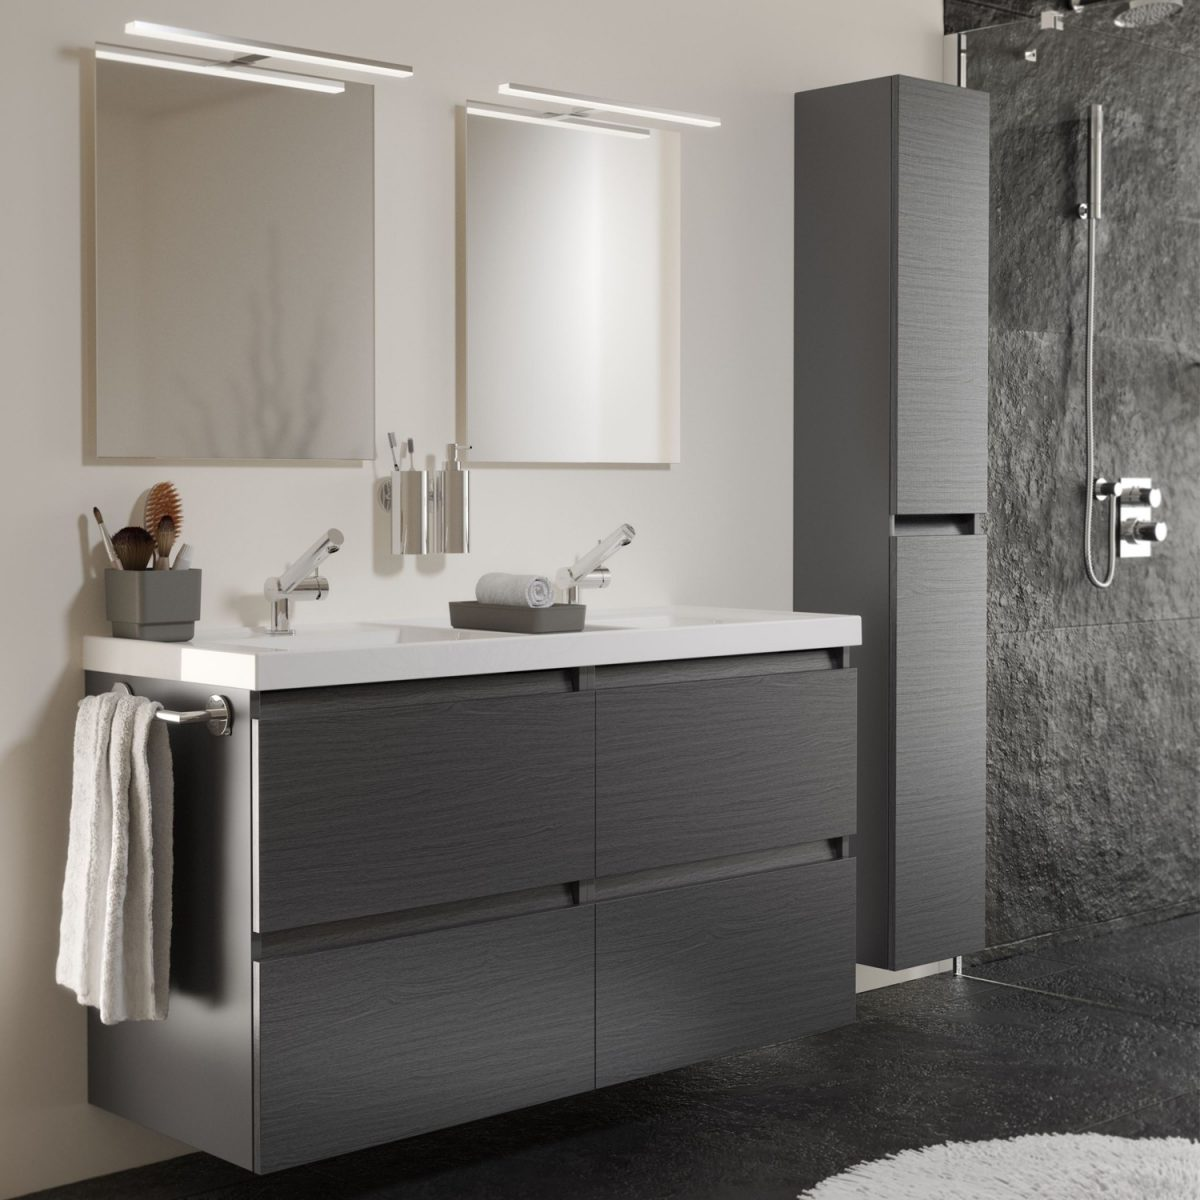 Mobile Bagno Lavandino Incasso mobili bagno sospesi